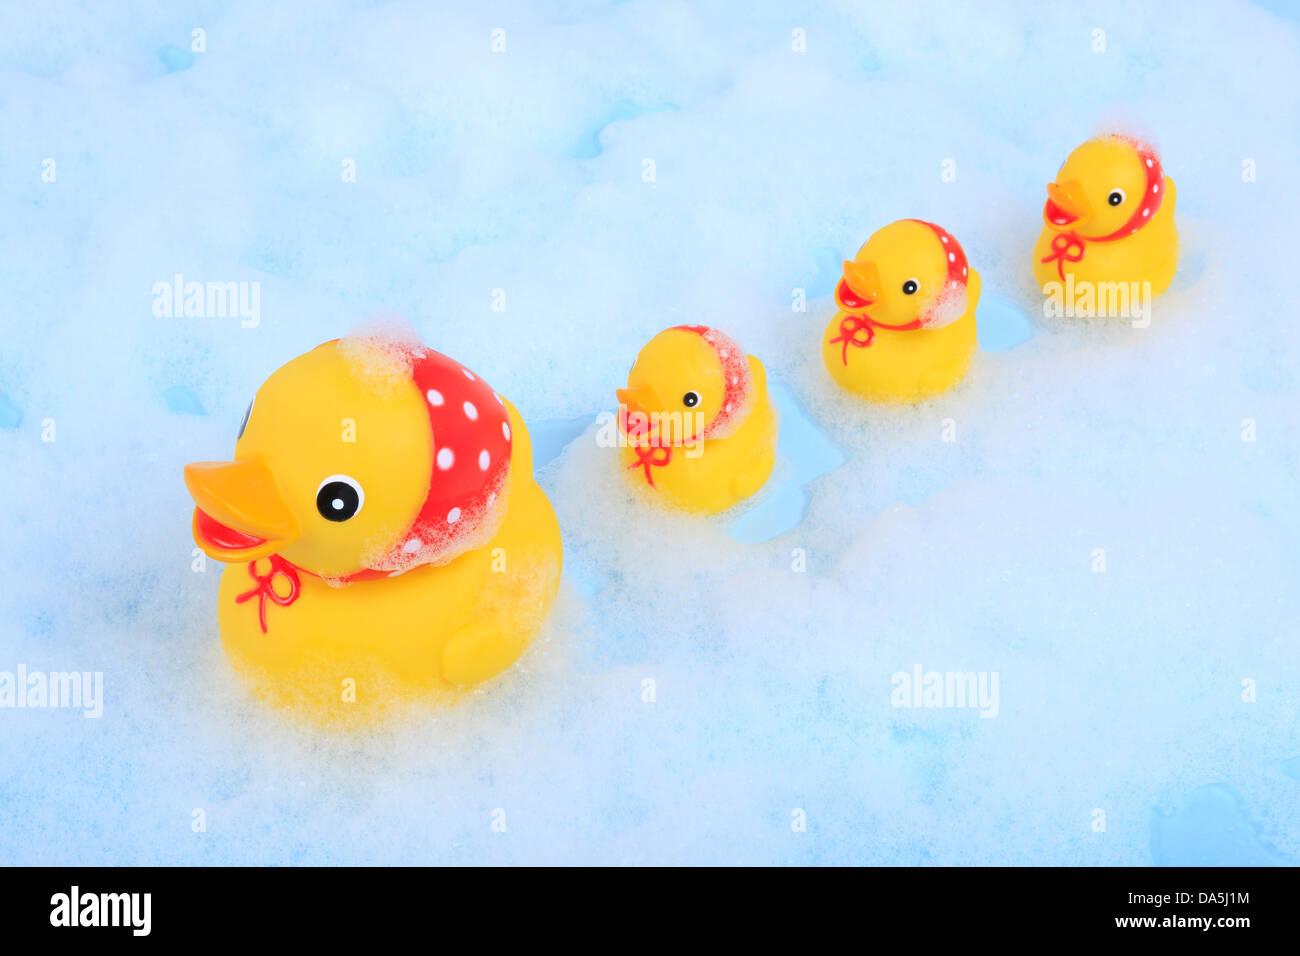 4, splashing, toys, baby, bathing, concepts, bath, duck, plastik ...